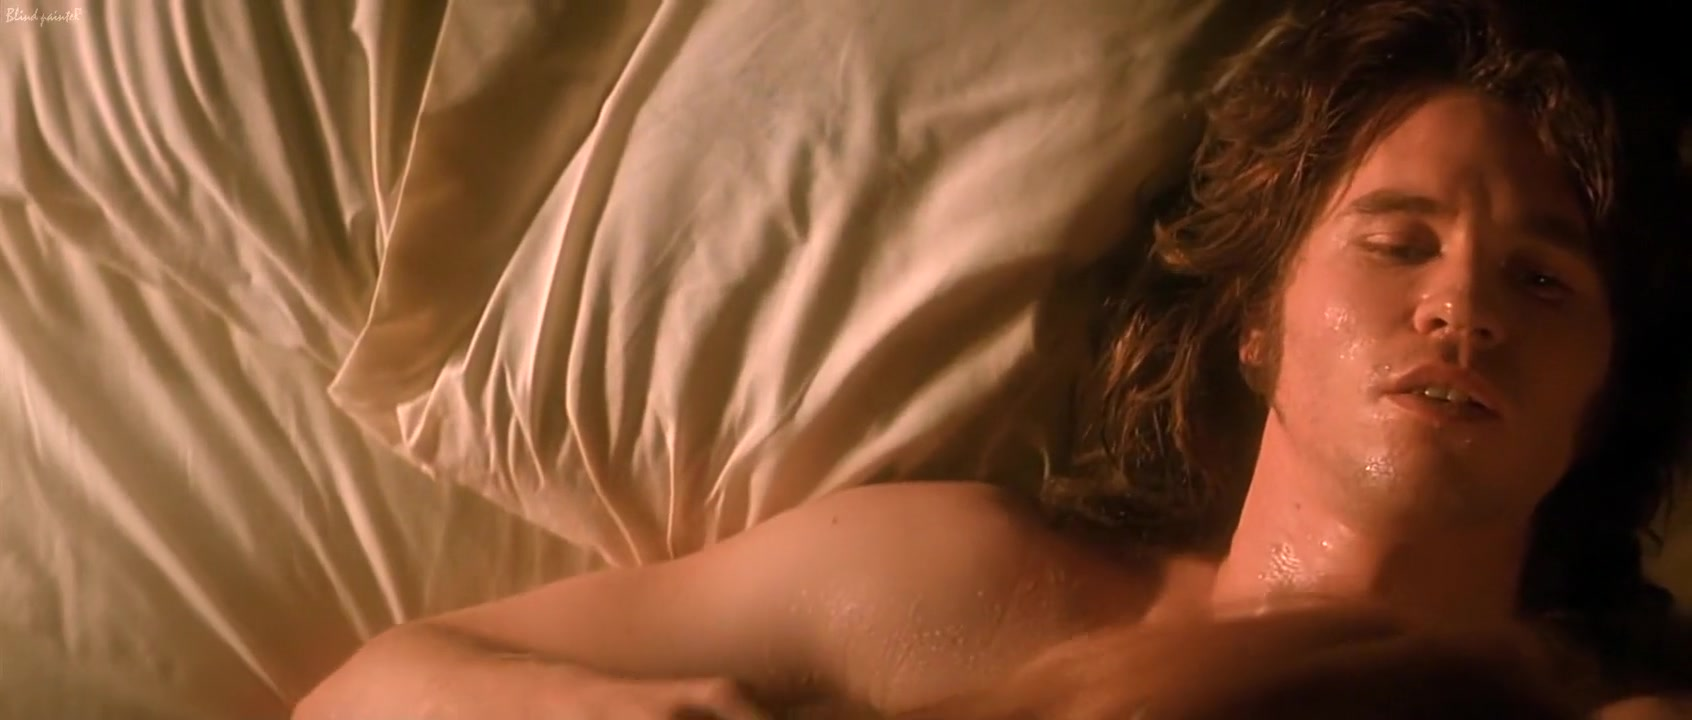 The Doors (1991) Meg Ryan, Christina Fulton college couple have great sex